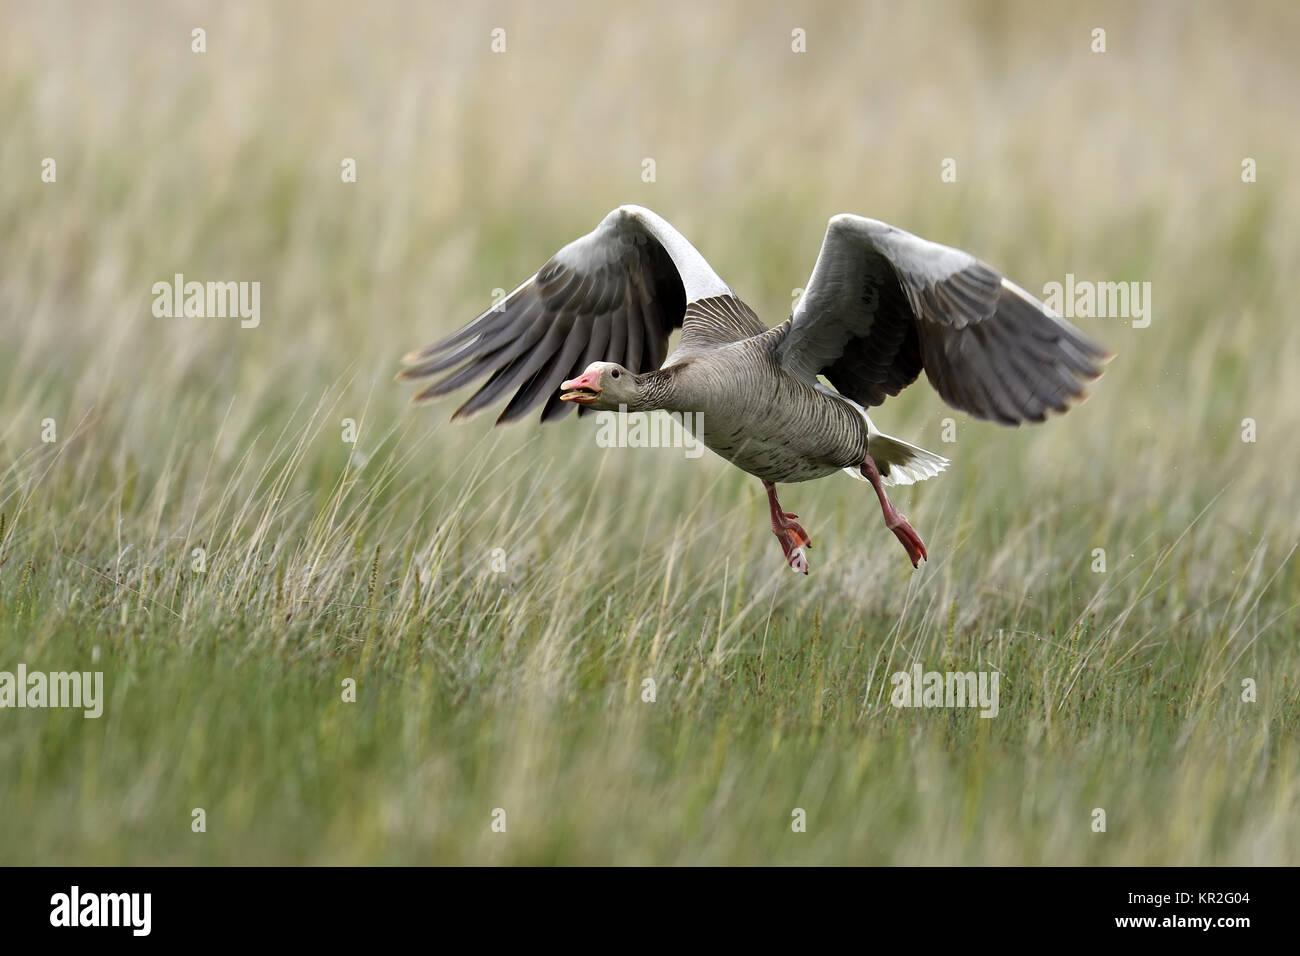 Greylag goose (Anser anser), approaching via meadow, National Park Kiskunsag, Hungary - Stock Image